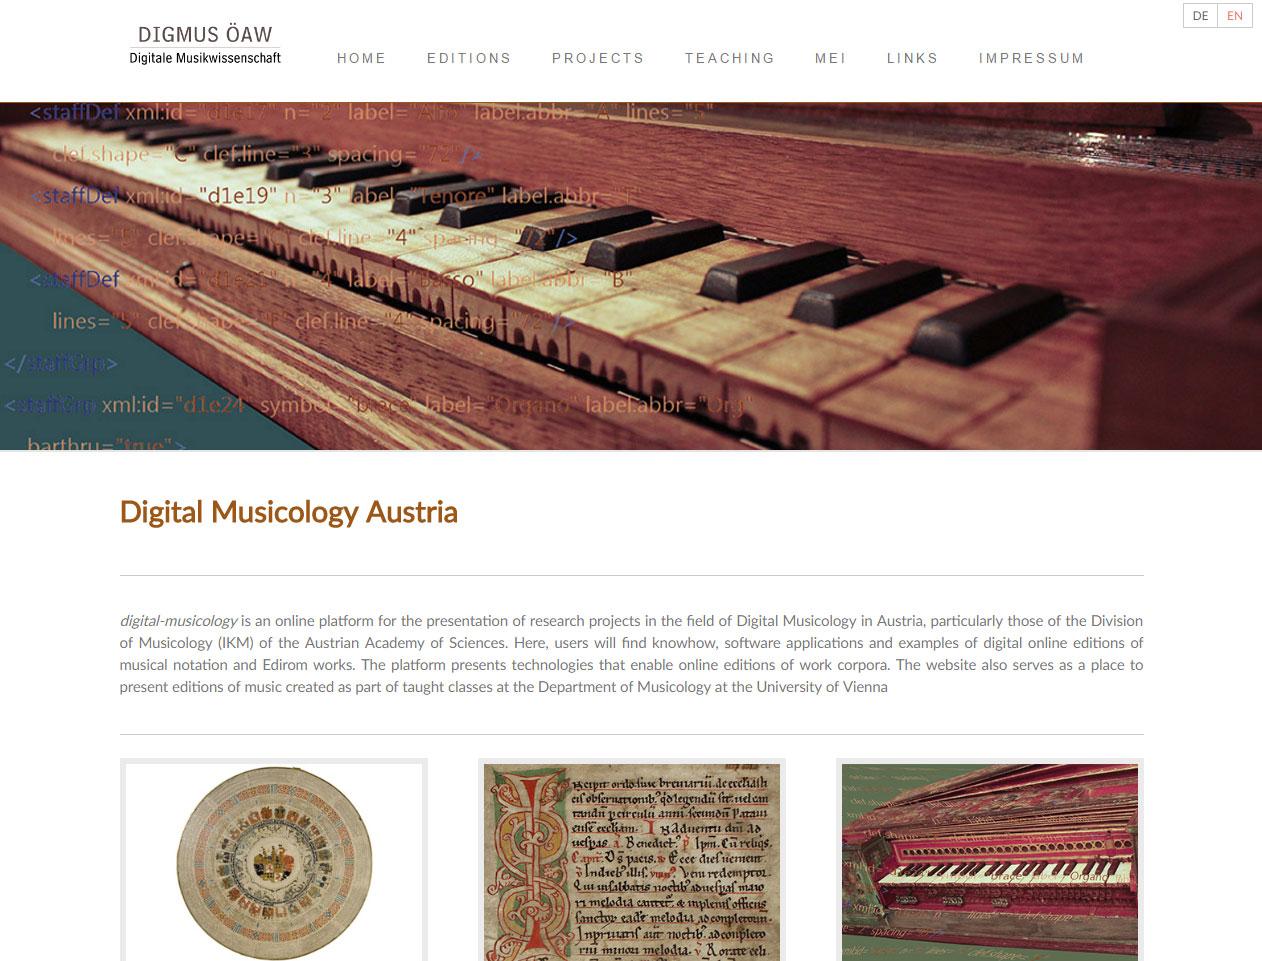 Website Of Digital Musicology Austria